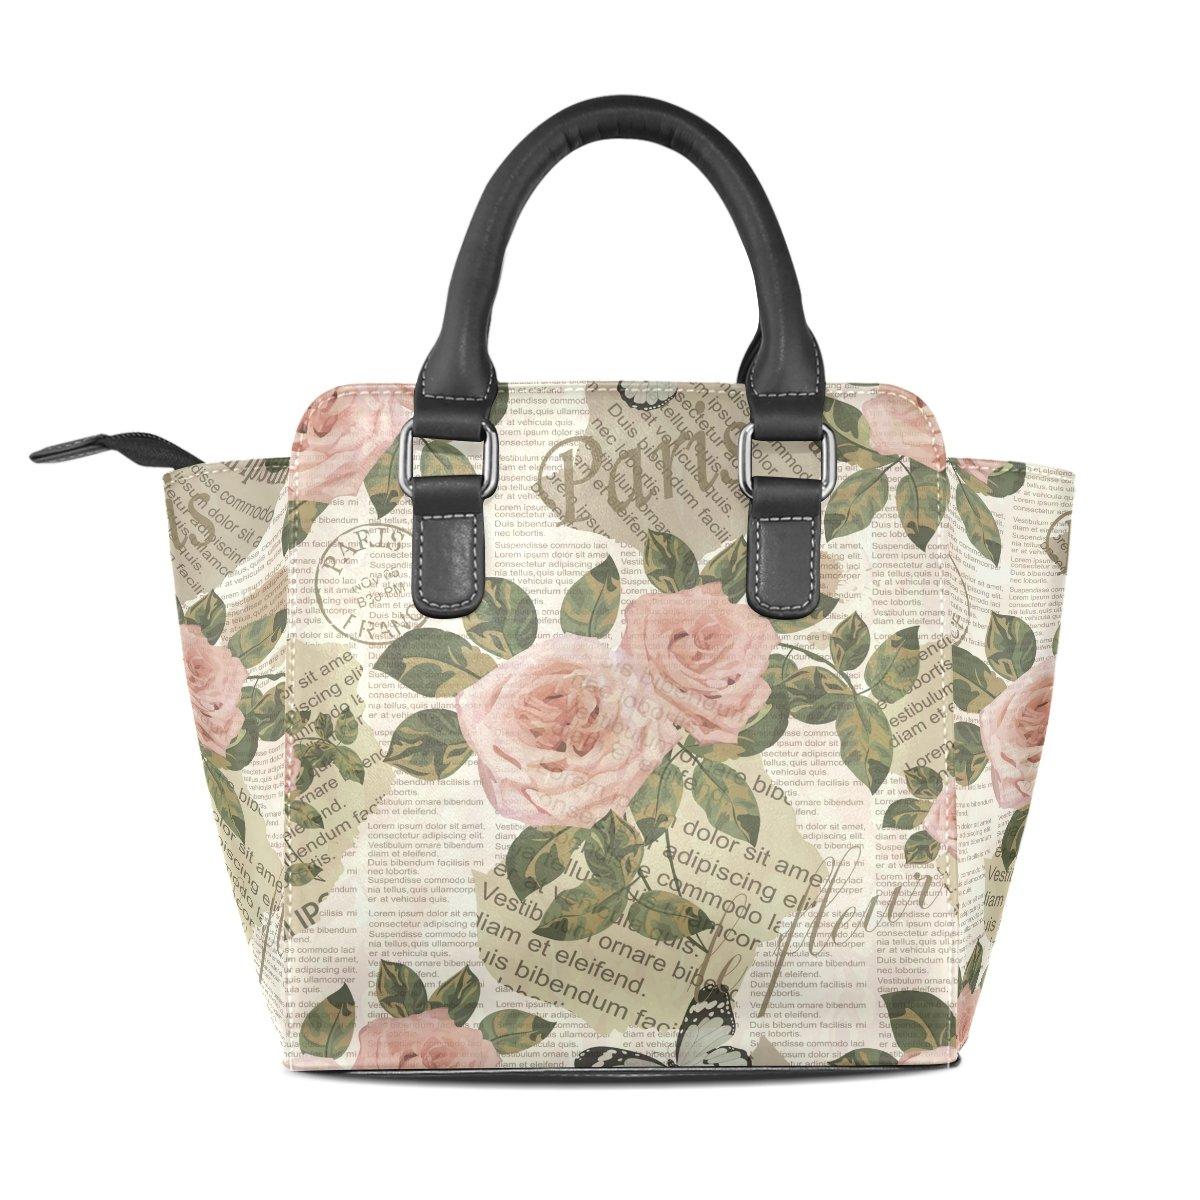 Womens Top Handle Satchel Handbag Paris Travel Vintage Newspaper Roses Ladies PU Leather Shoulder Bag Crossbody Bag